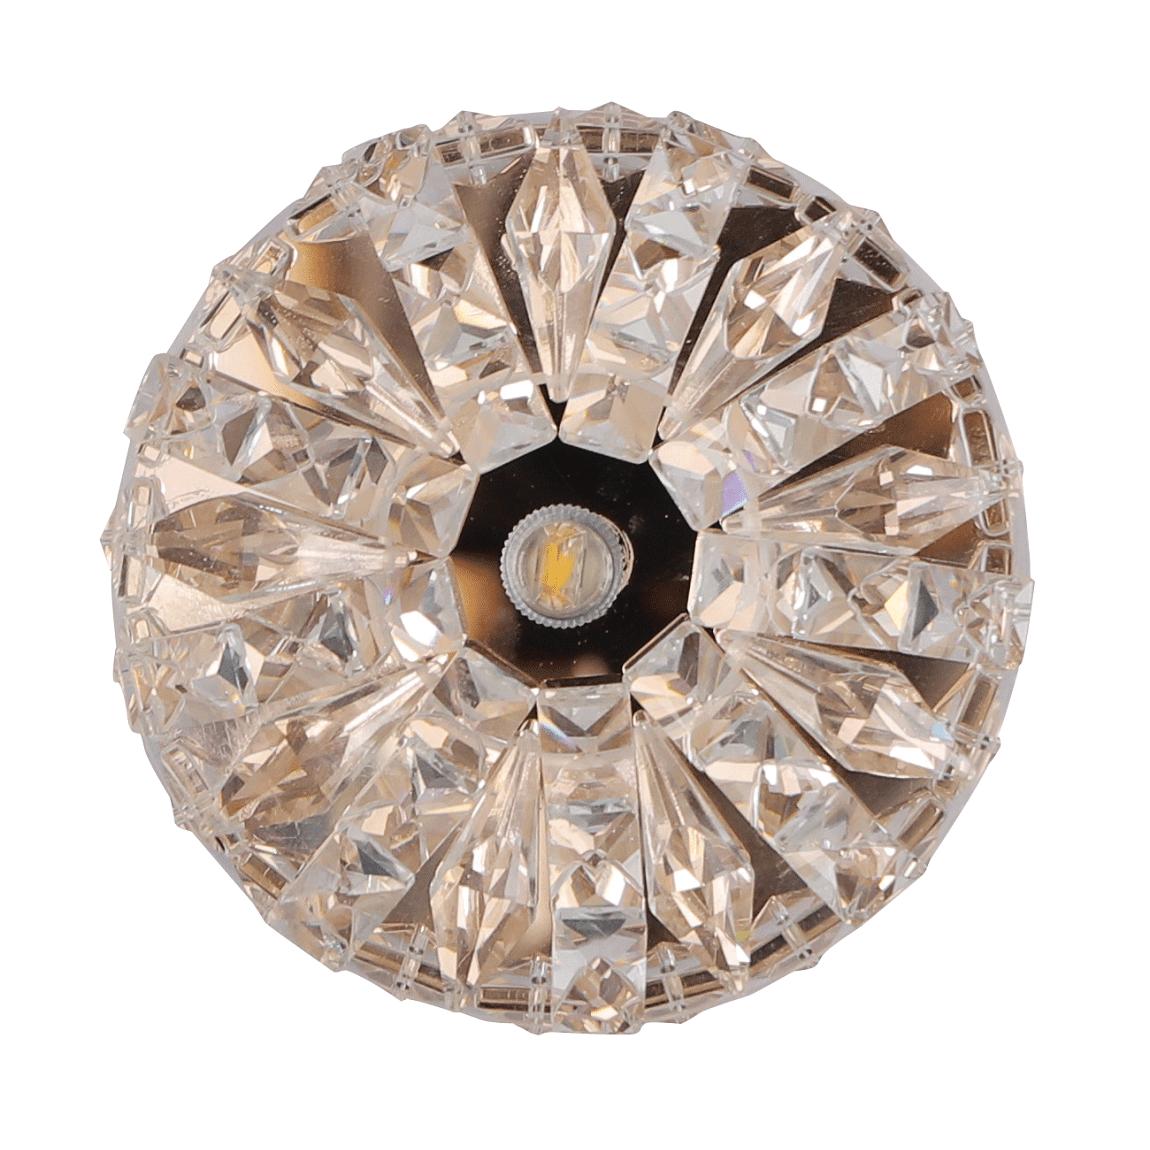 FORLIFE FL-1838 - 5 Watt Kristal LED Spot